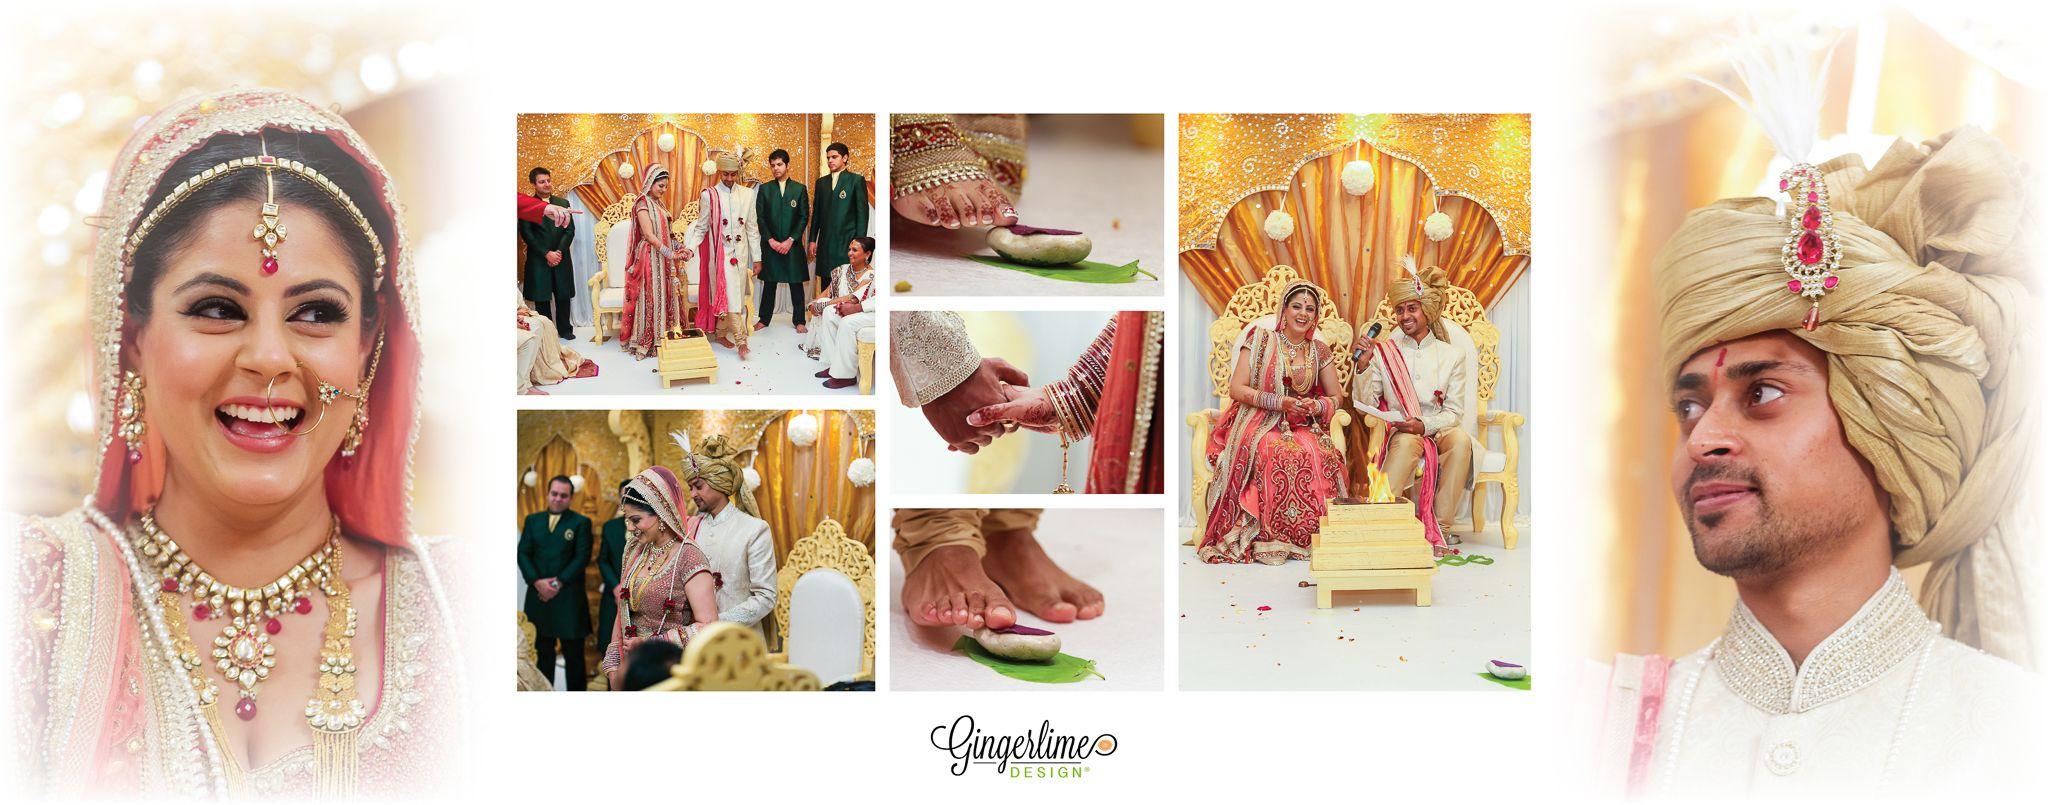 Bride And Groom Hindu Wedding Wedding Album Wedding Dress